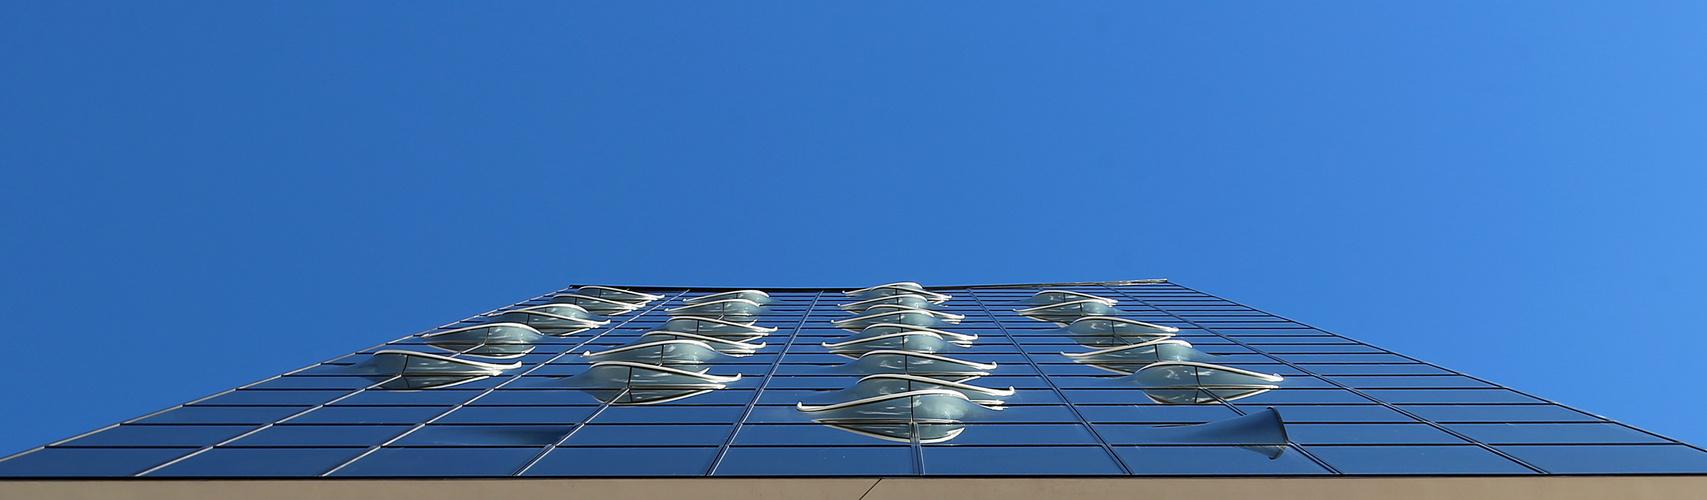 Hamburg Elbphilharmonie -4- Fassade